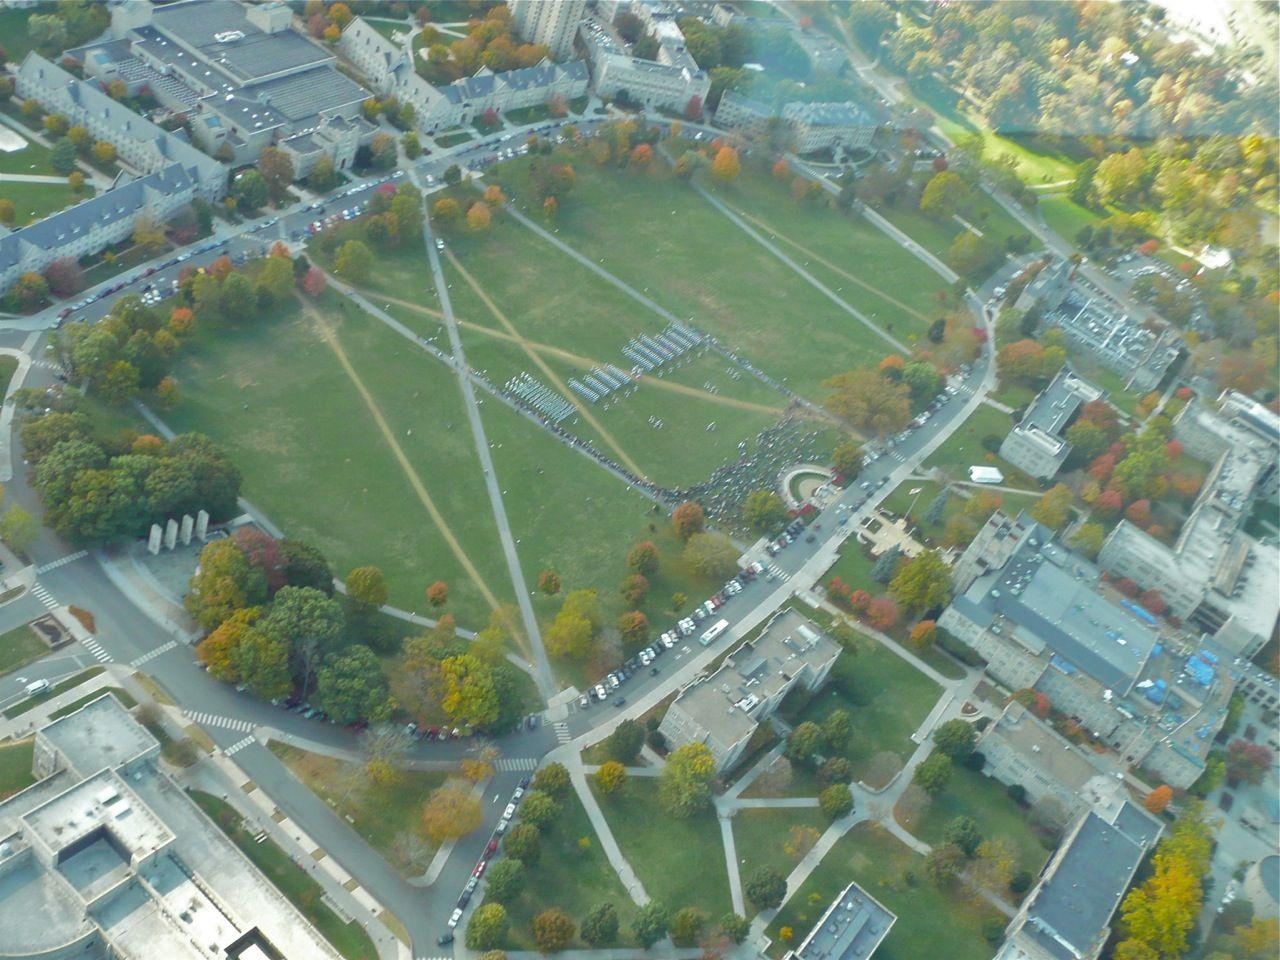 War Memorial Pylons and Drillfield, Virginia Tech Aerial